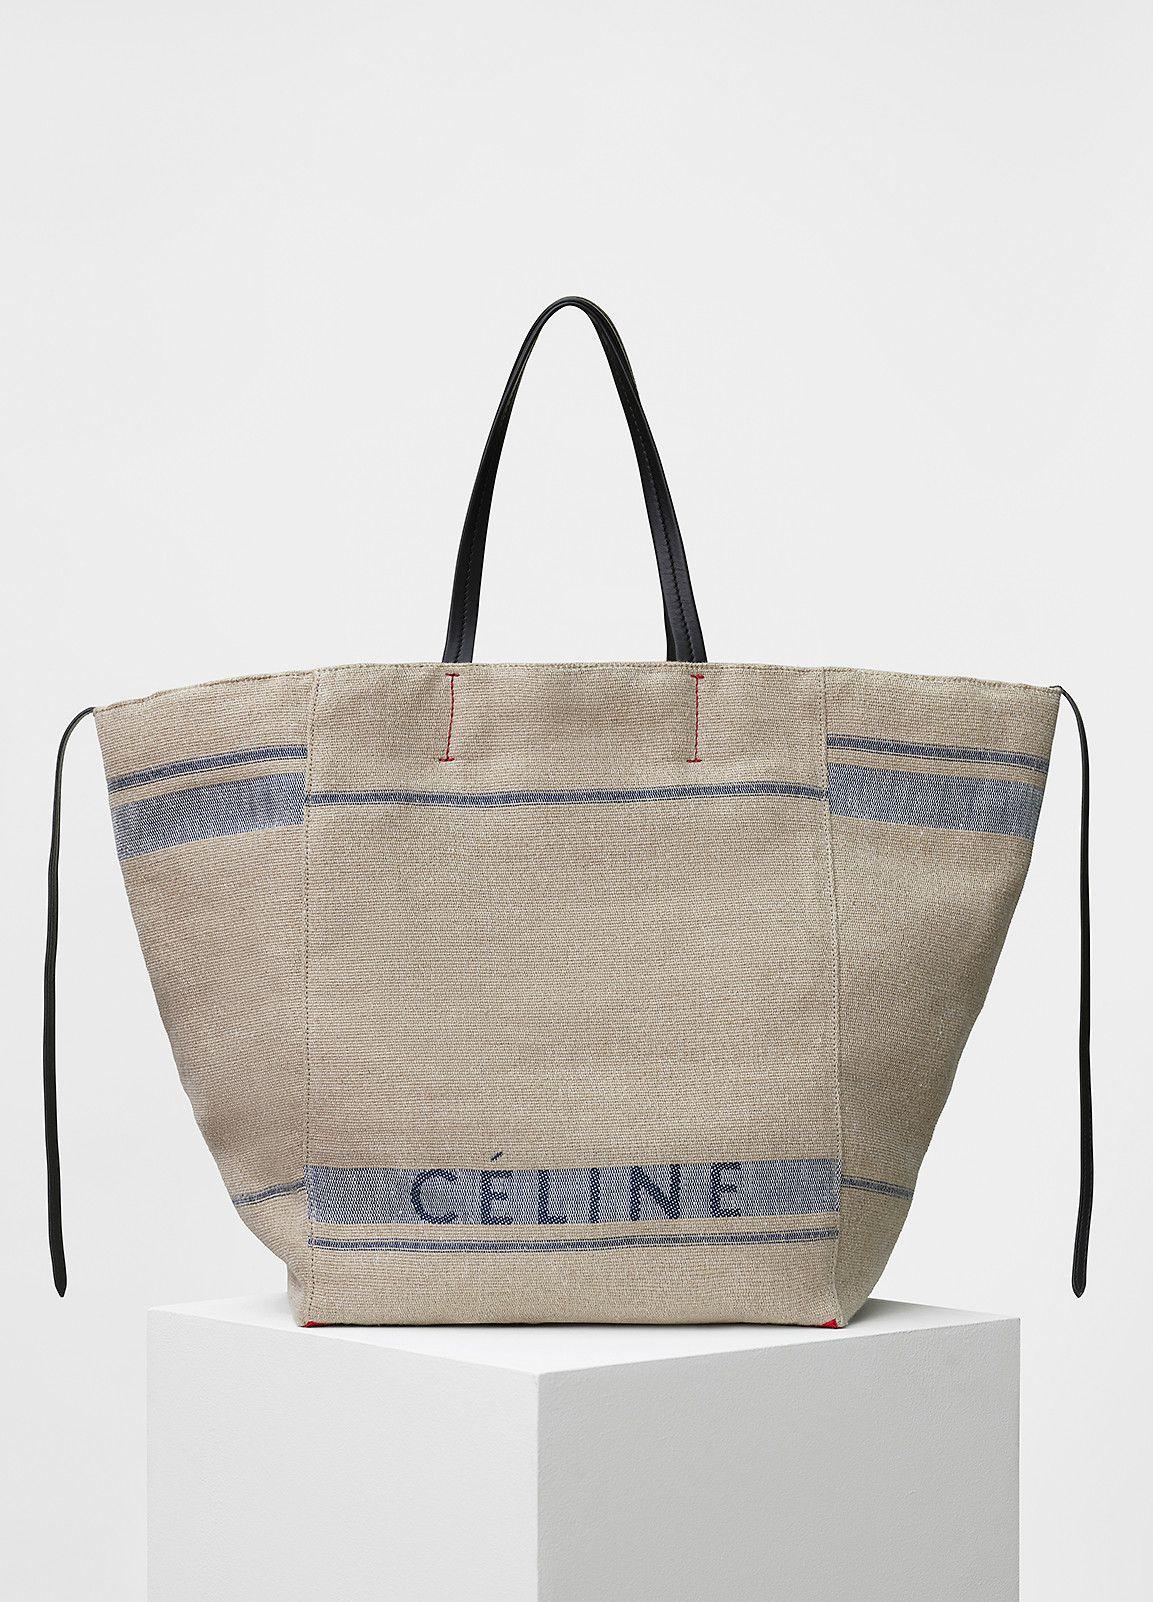 baby bag https://www.celine.com/en/collections/summer/leather ...